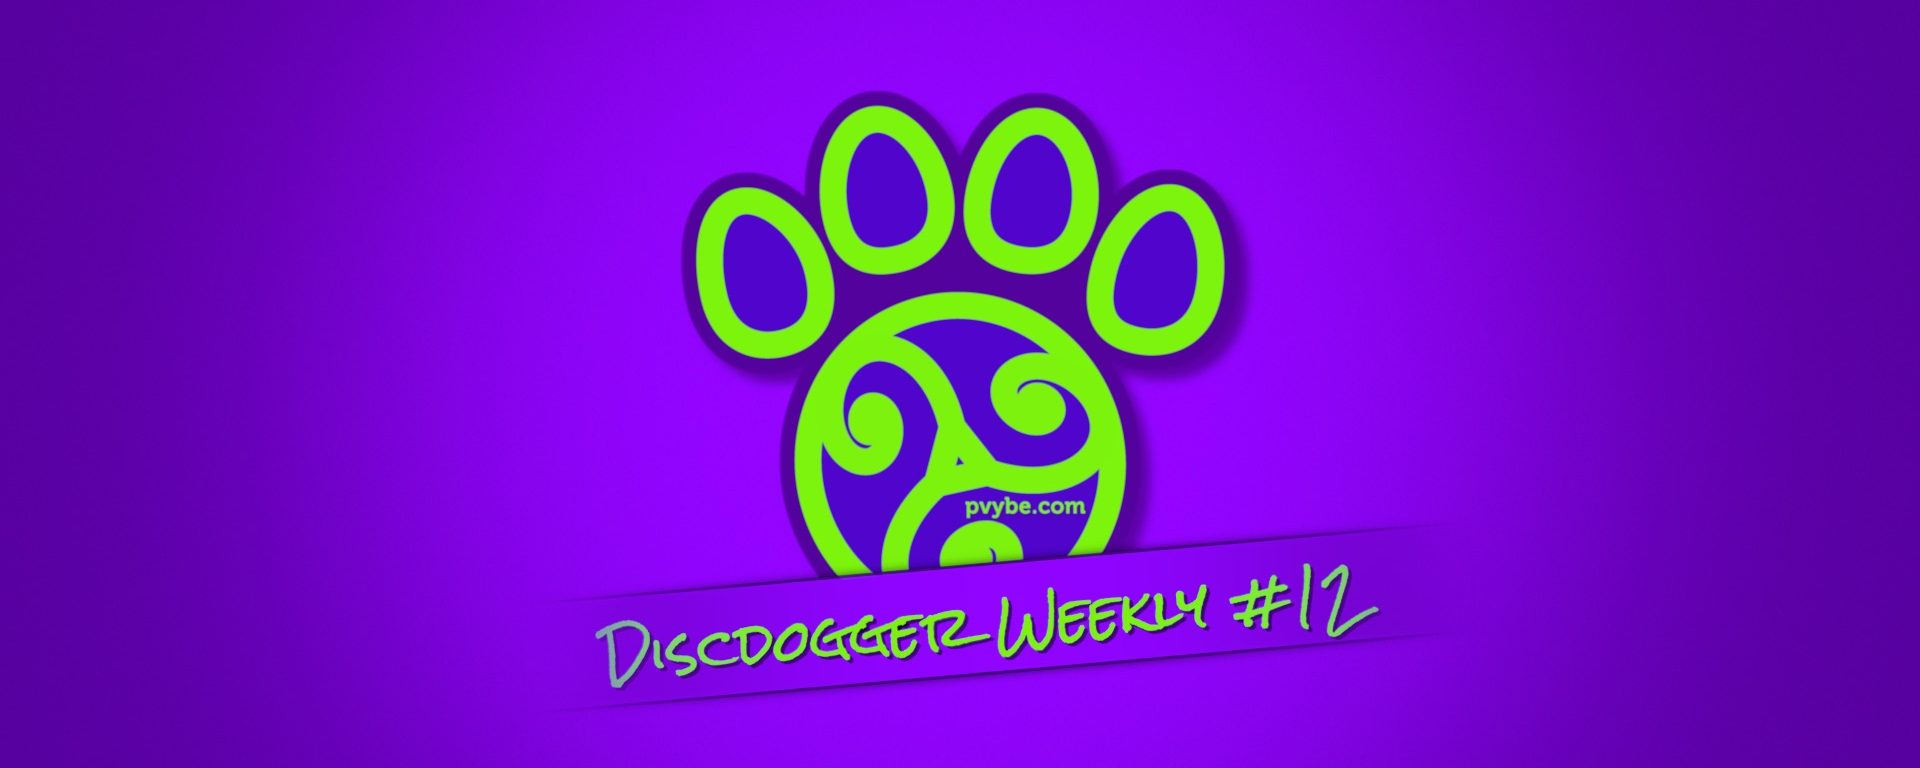 DiscDogger Weekly #12 | Puppy Foundation, Team Movement, Flamingo & Flamingitis